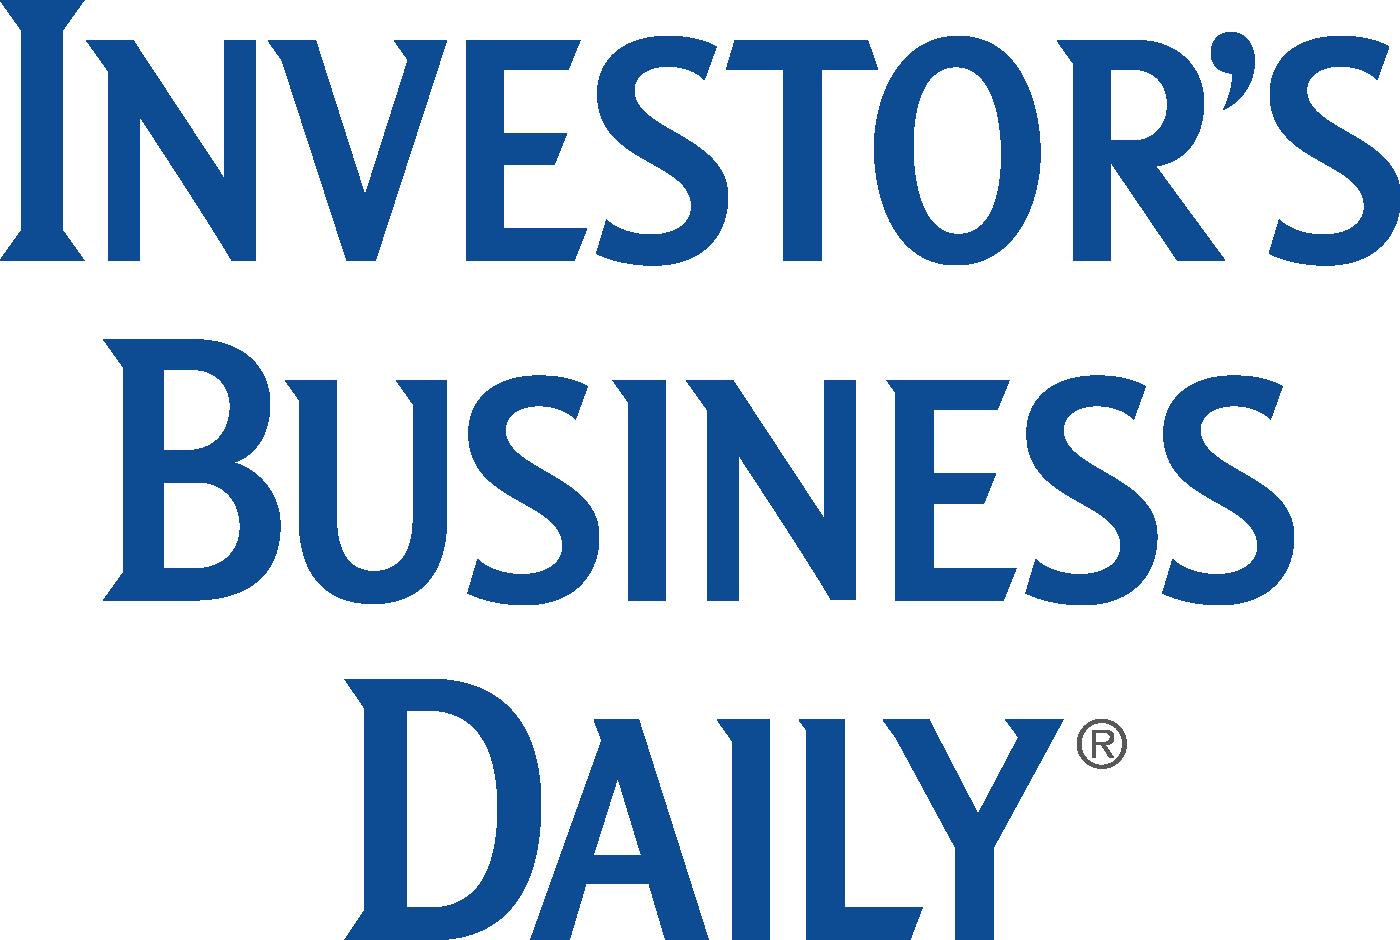 Investor's Business Daily Man Mansfield, TX Miller Premier Investment Planning LLC